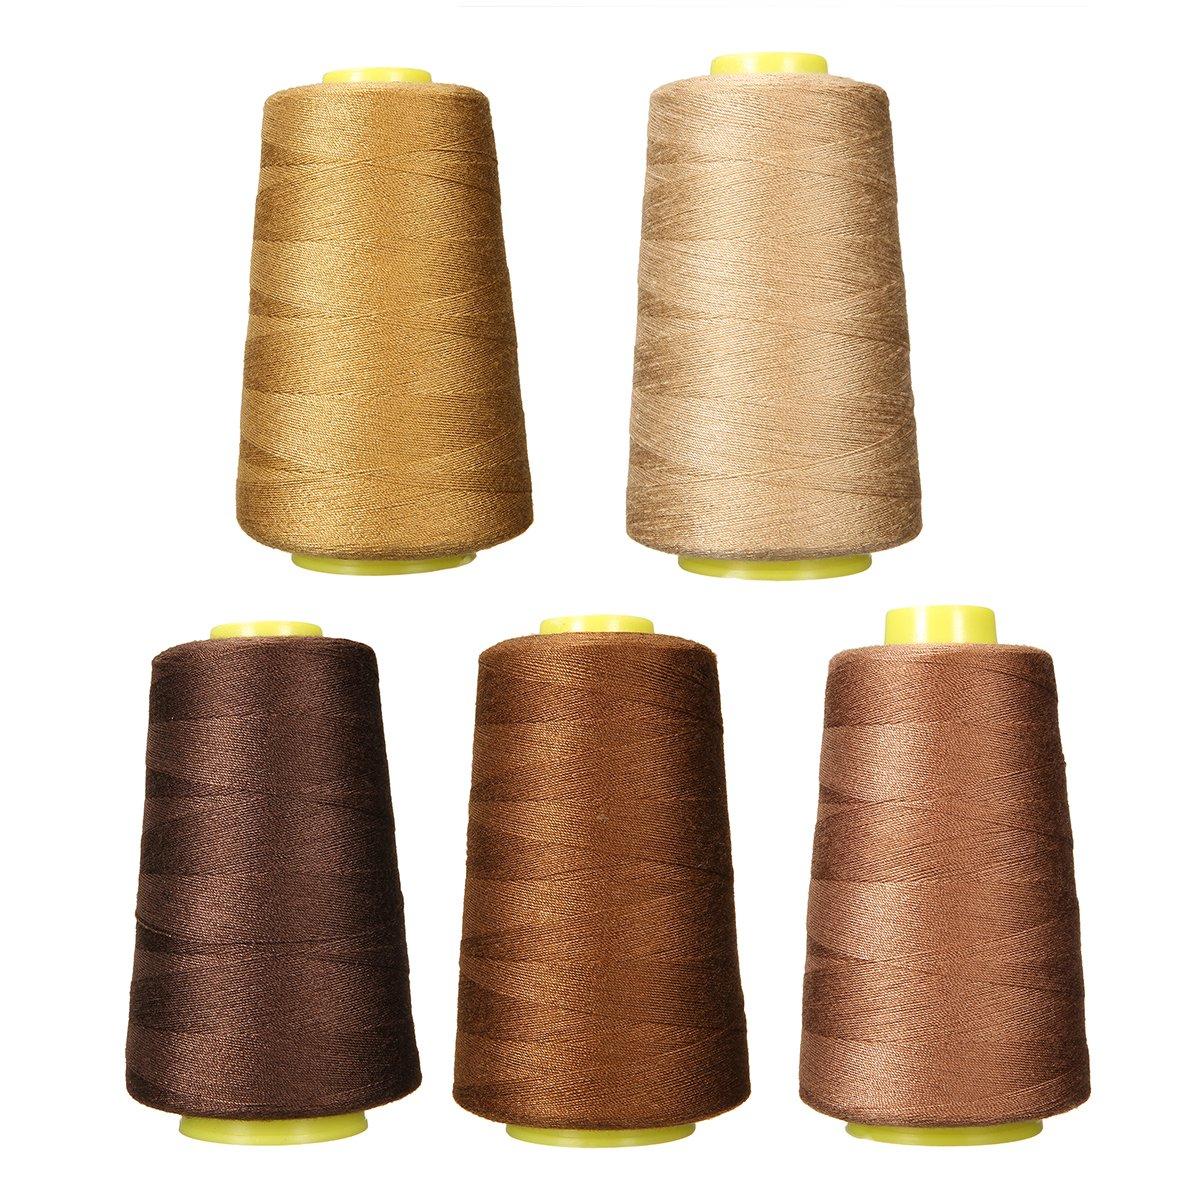 KAGEN quality sewing thread set of 10 thread//sewing machine thread 7... 800m